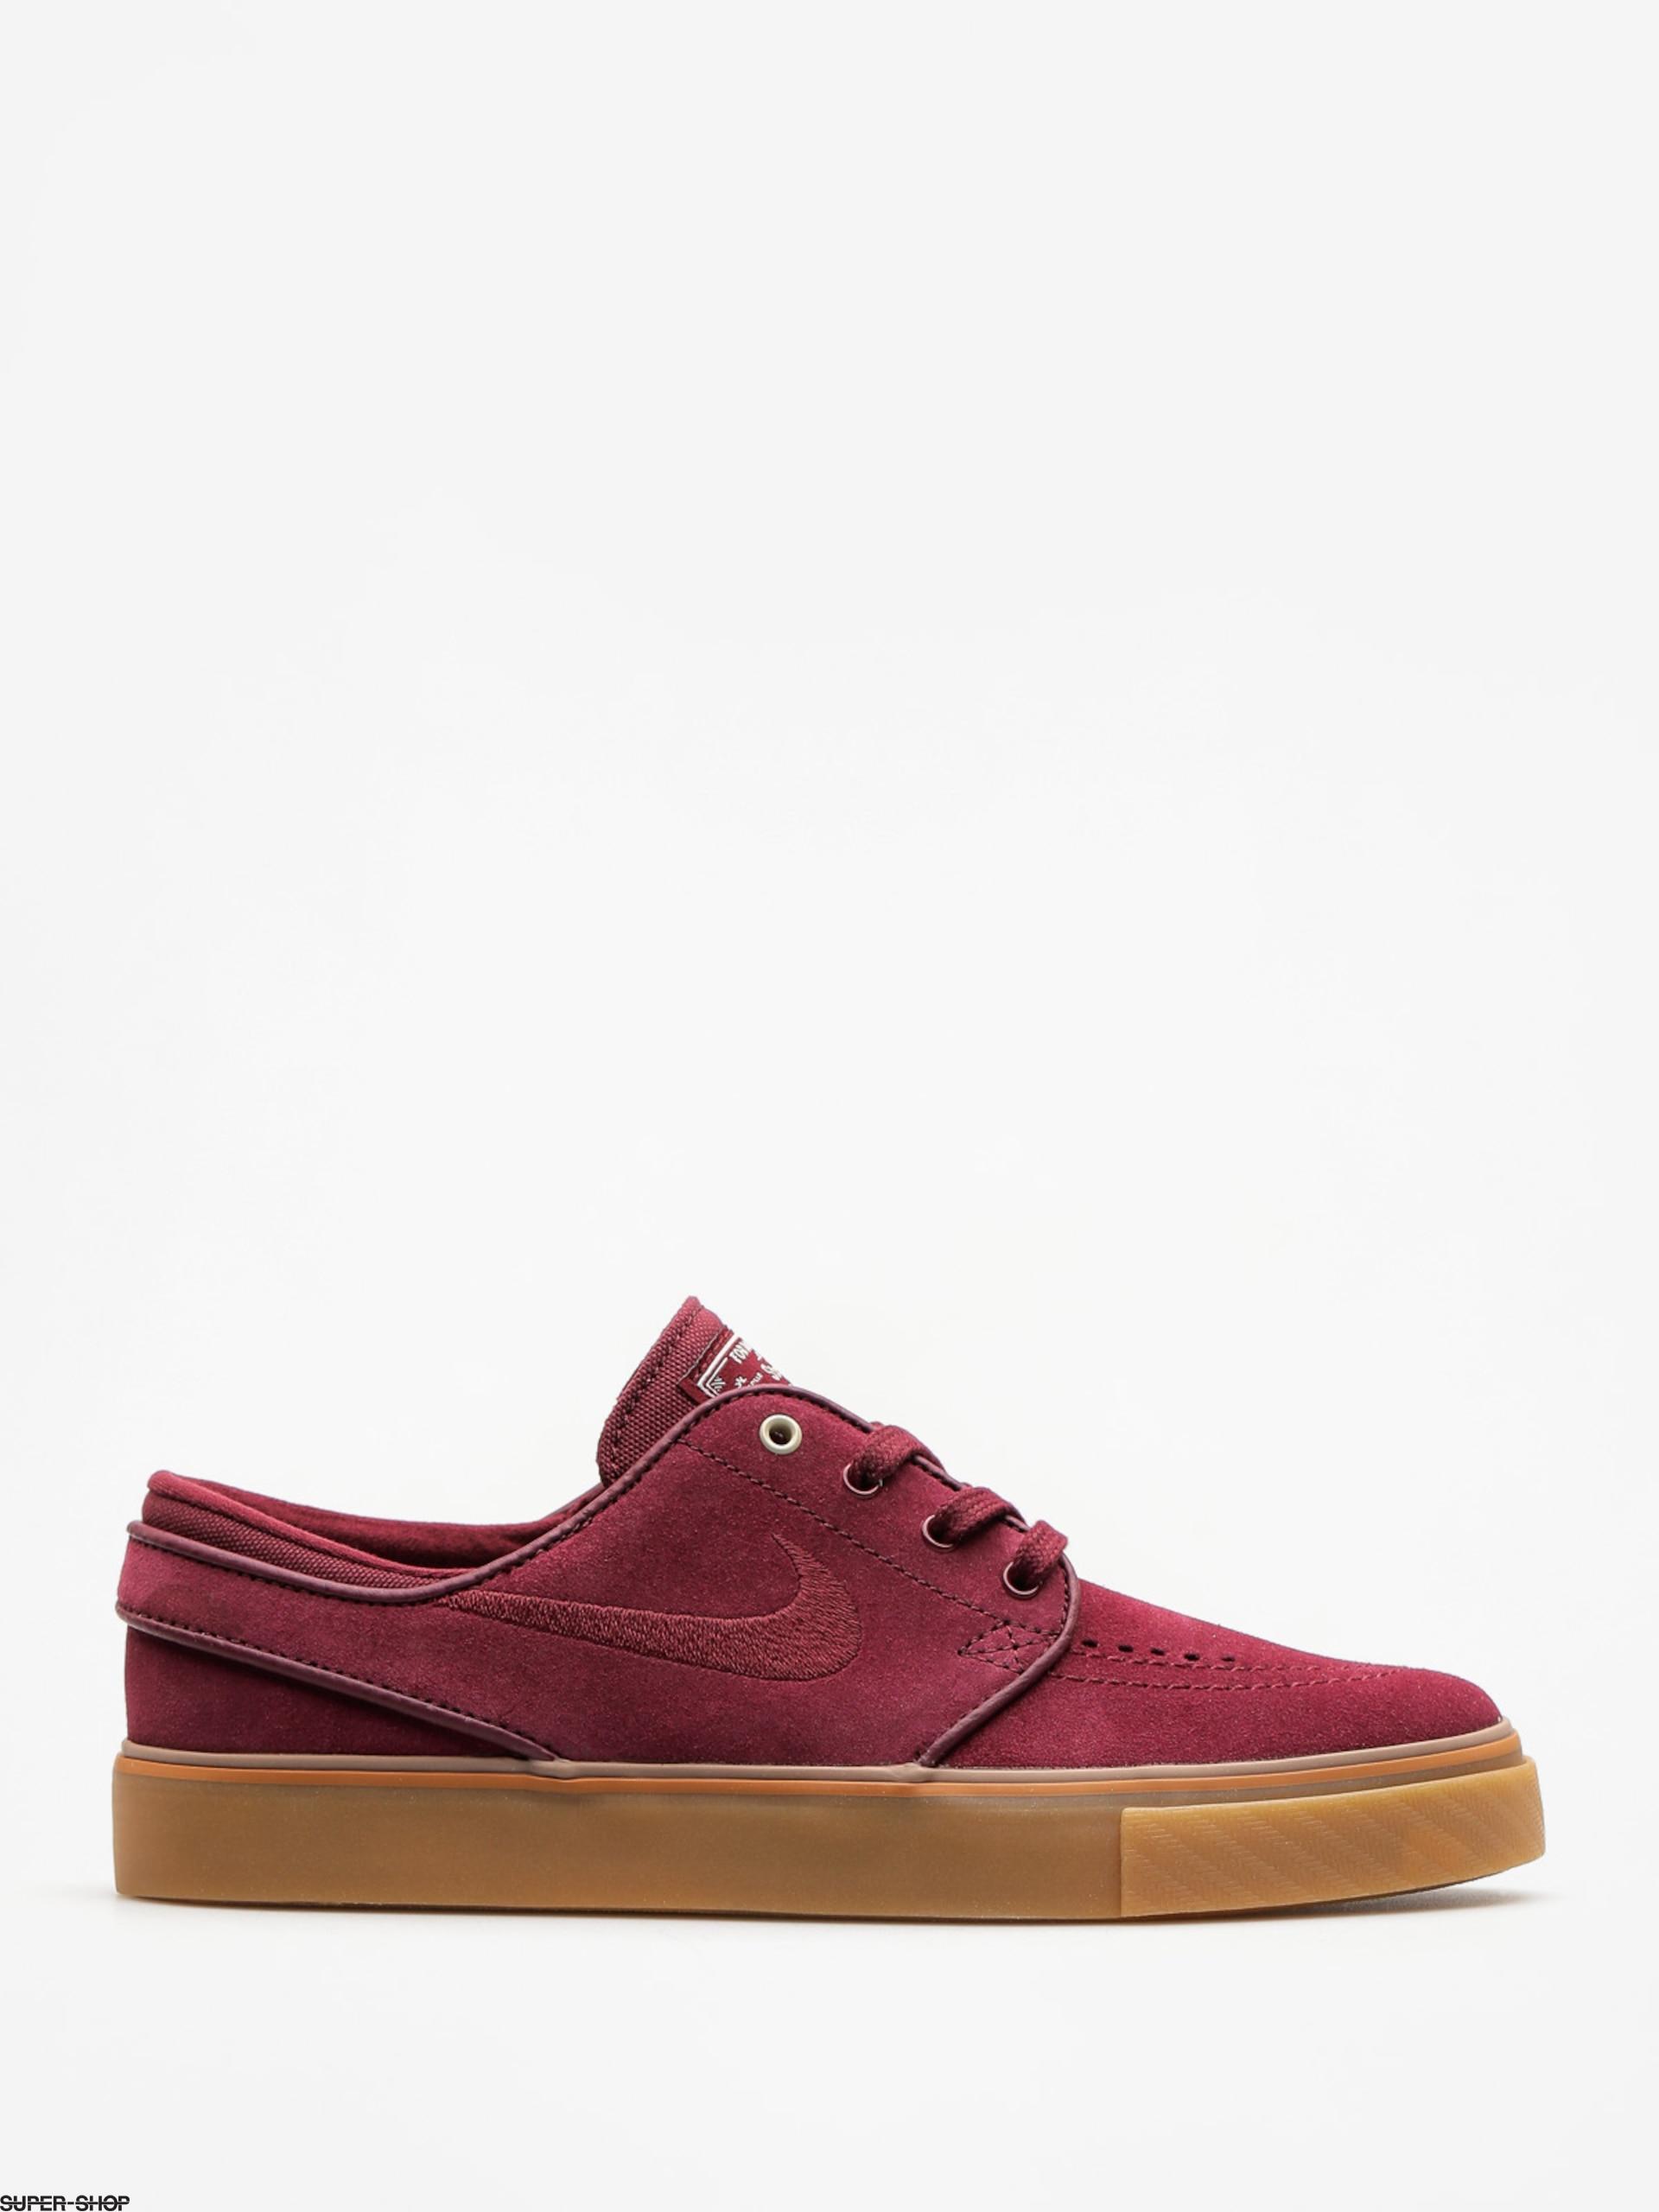 47a8a4342ea3 Nike SB Shoes Air Zoom Stefan Janoski Wmn (night maroon night maroon light  bone)